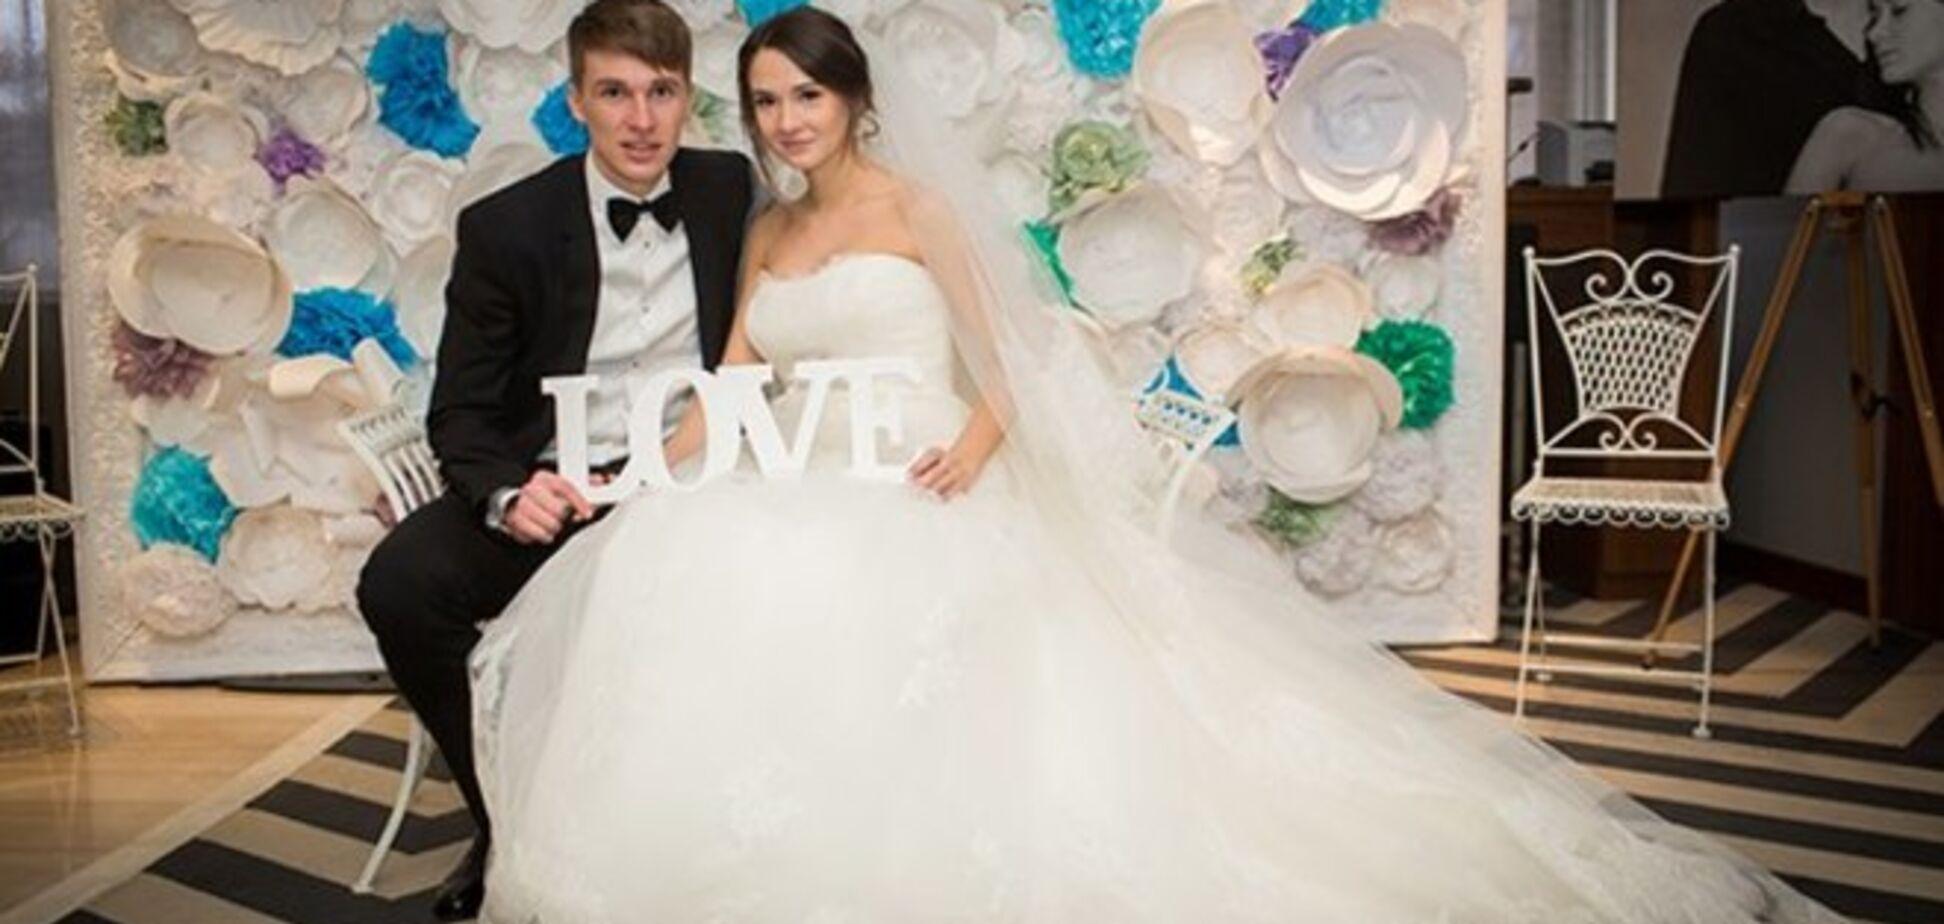 Появилось фото с красивой свадьбы футболиста 'Динамо' Сидорчука